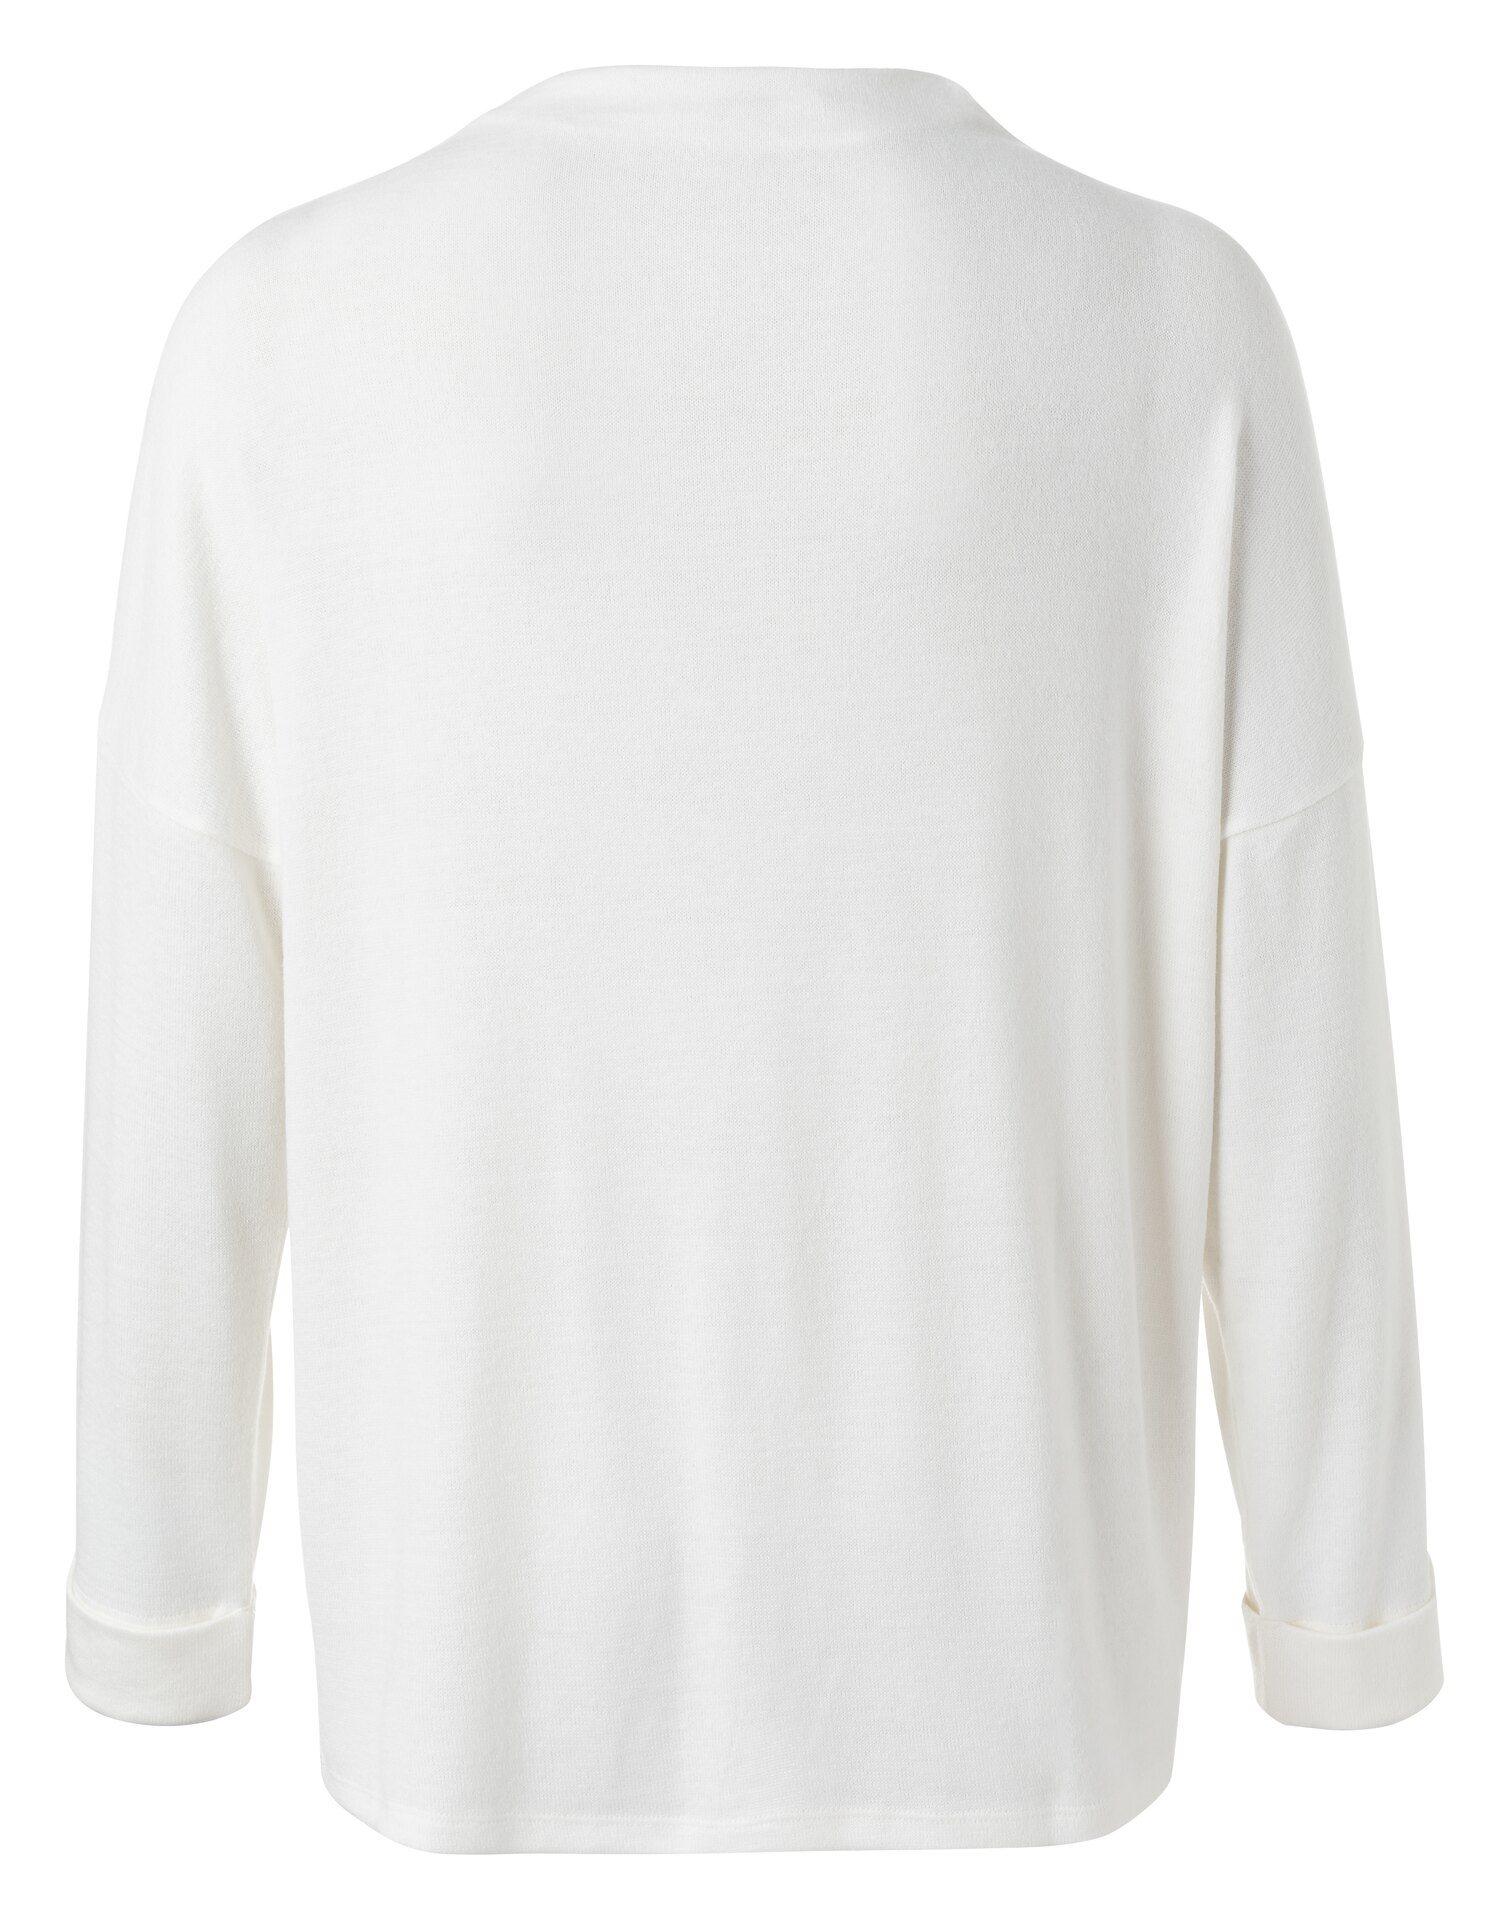 Sweater Brushed Boatneck